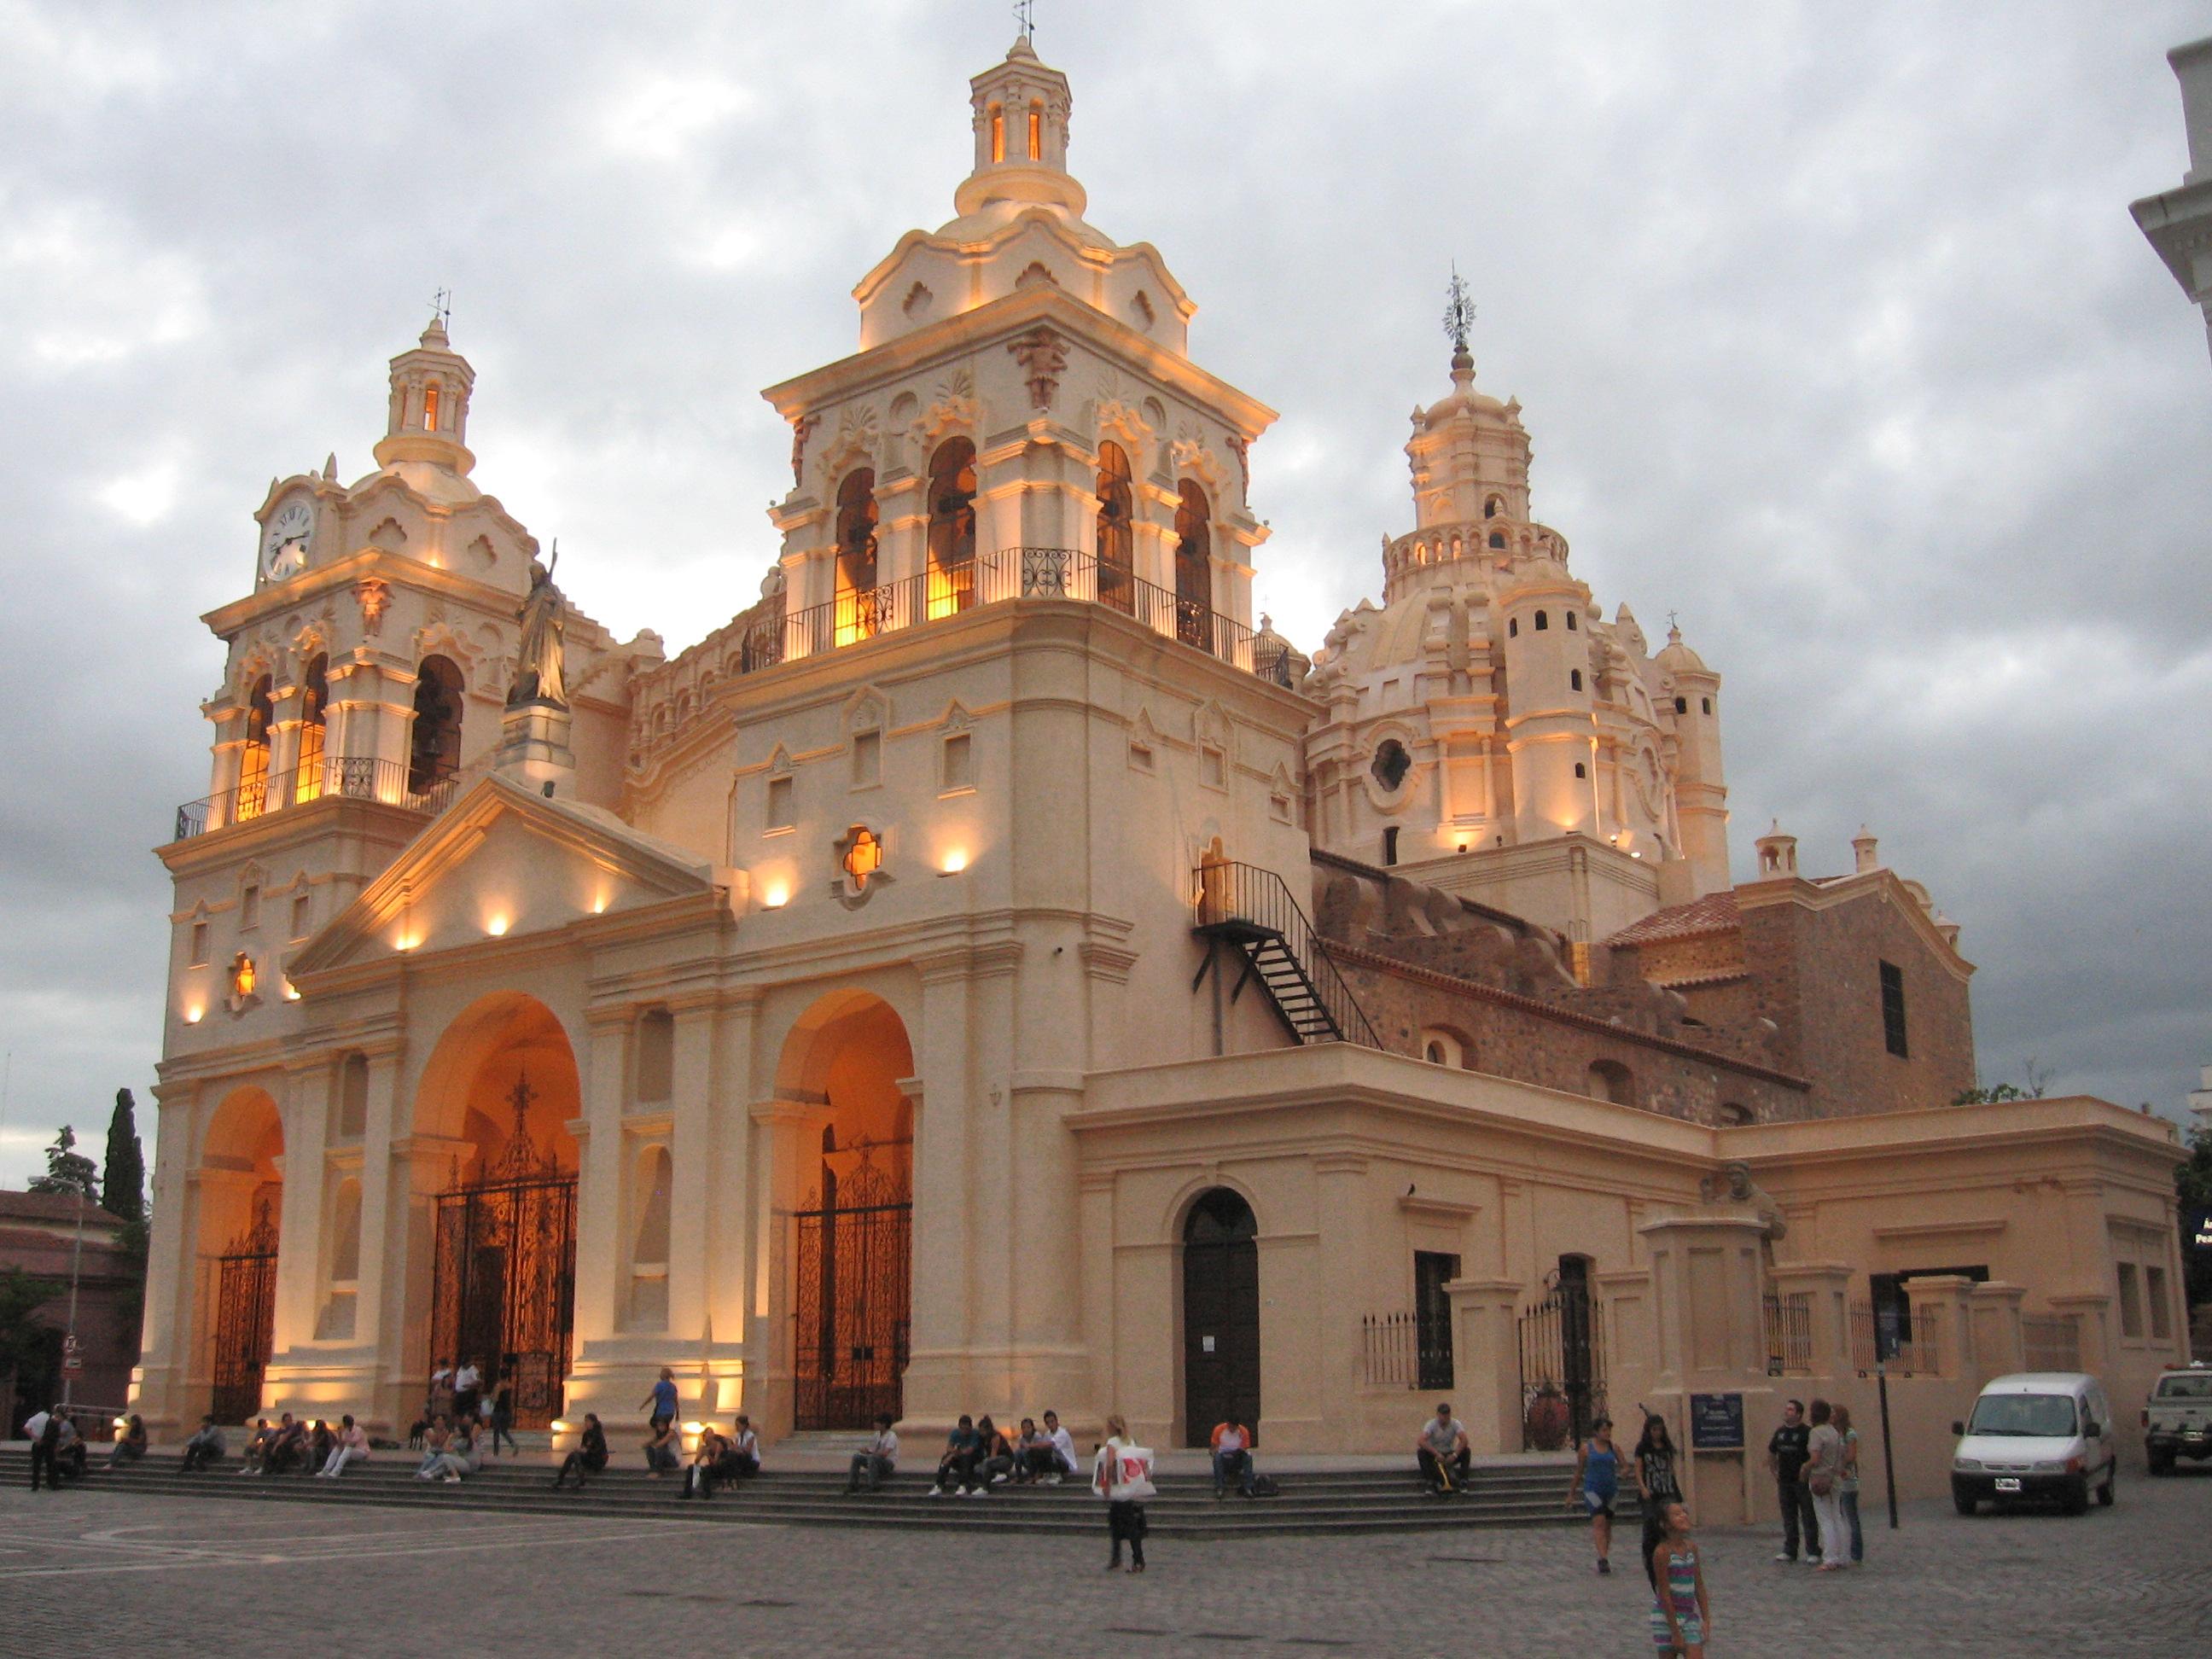 File:Catedral de Córdoba a la tarde.JPG - Wikimedia Commons